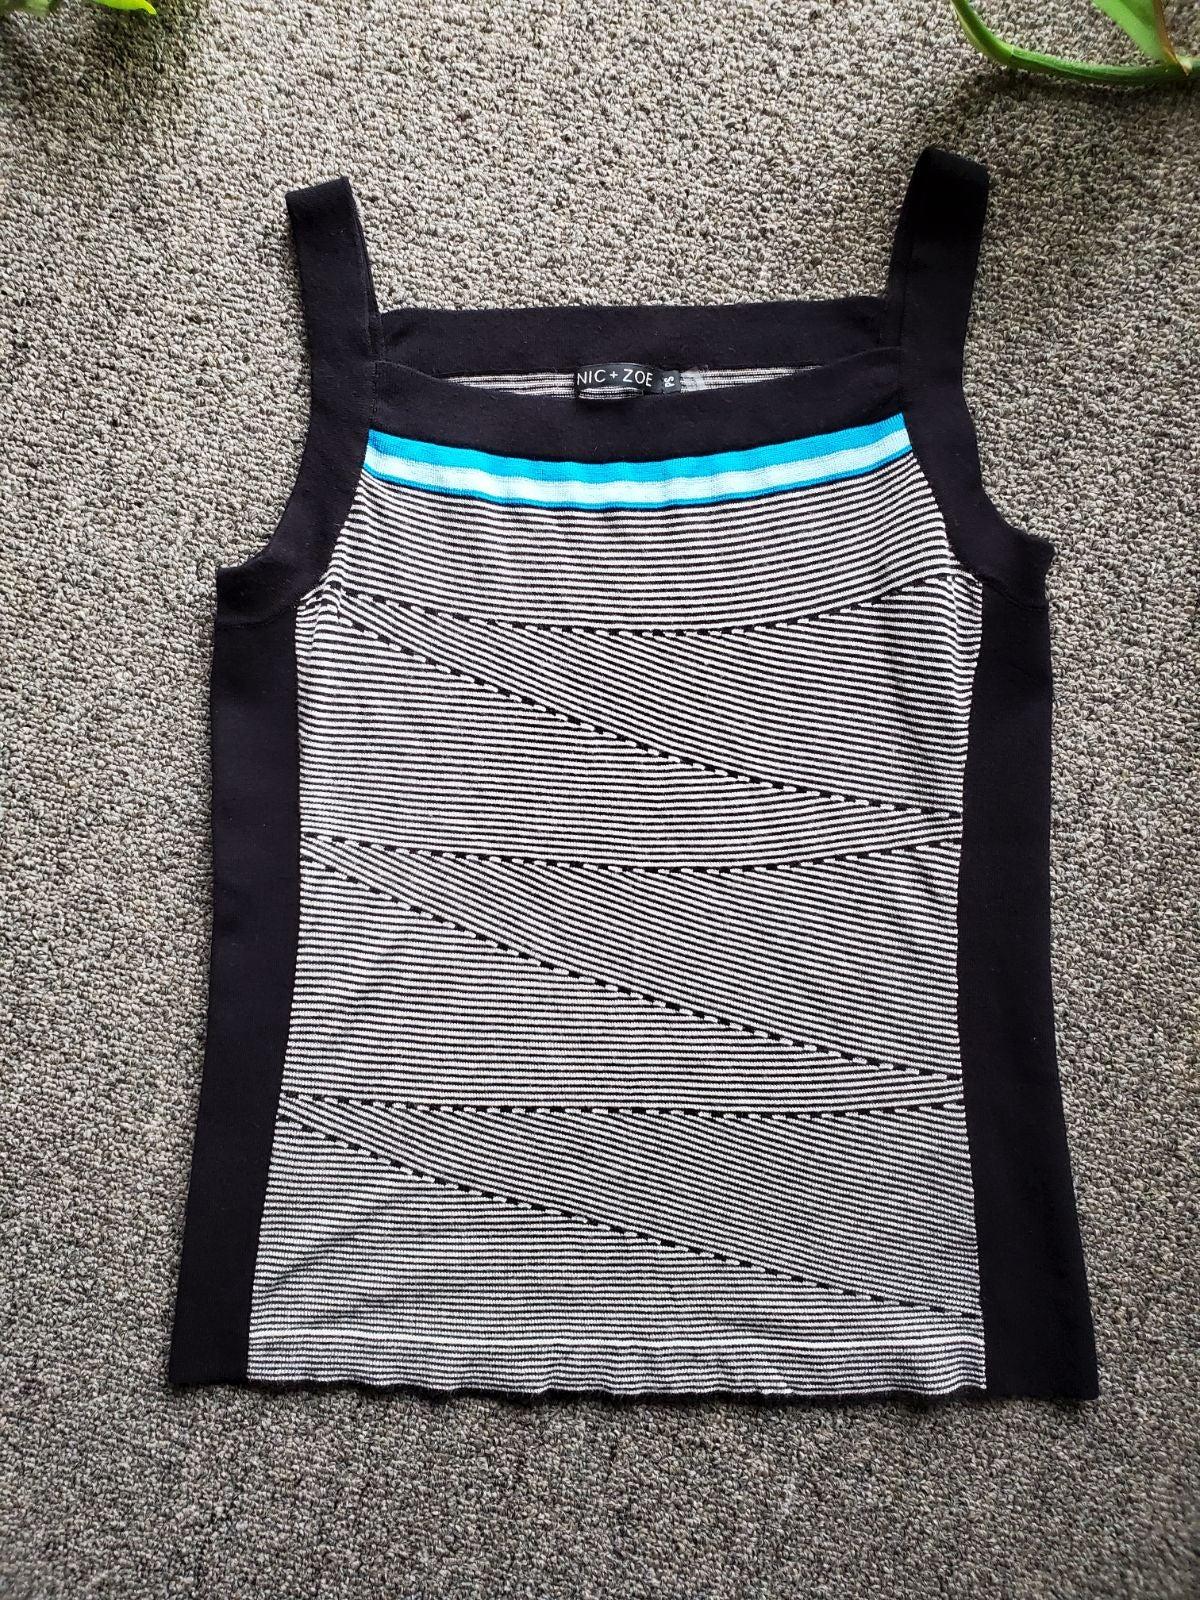 Nic + Zoe knit grey black tank top